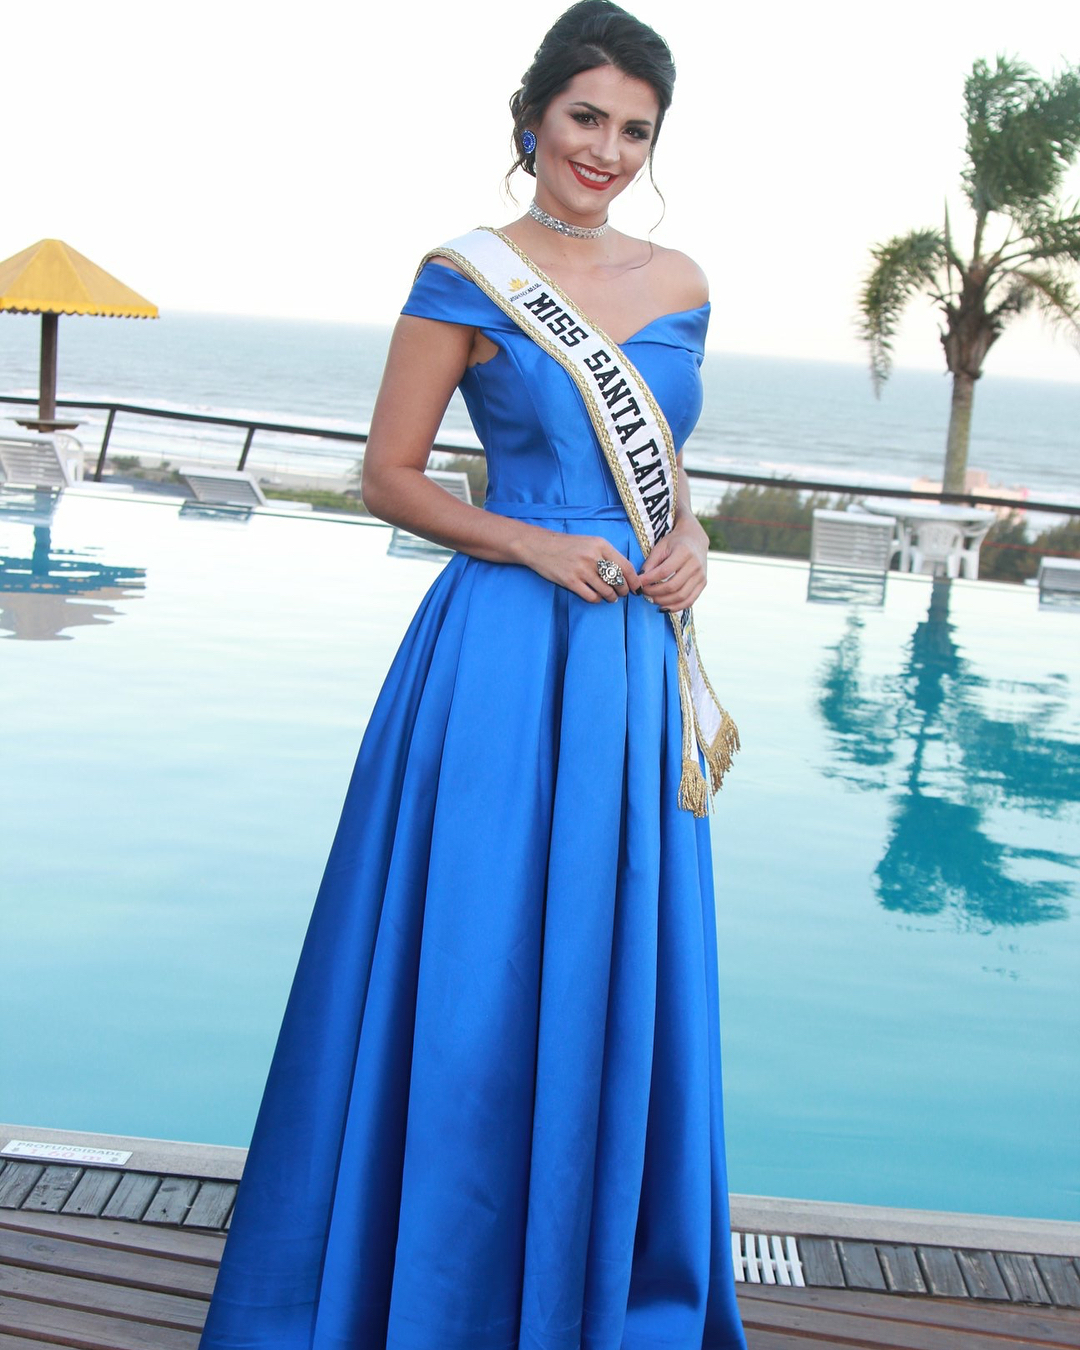 thylara brenner, miss brasil continentes unidos 2019. 28754110